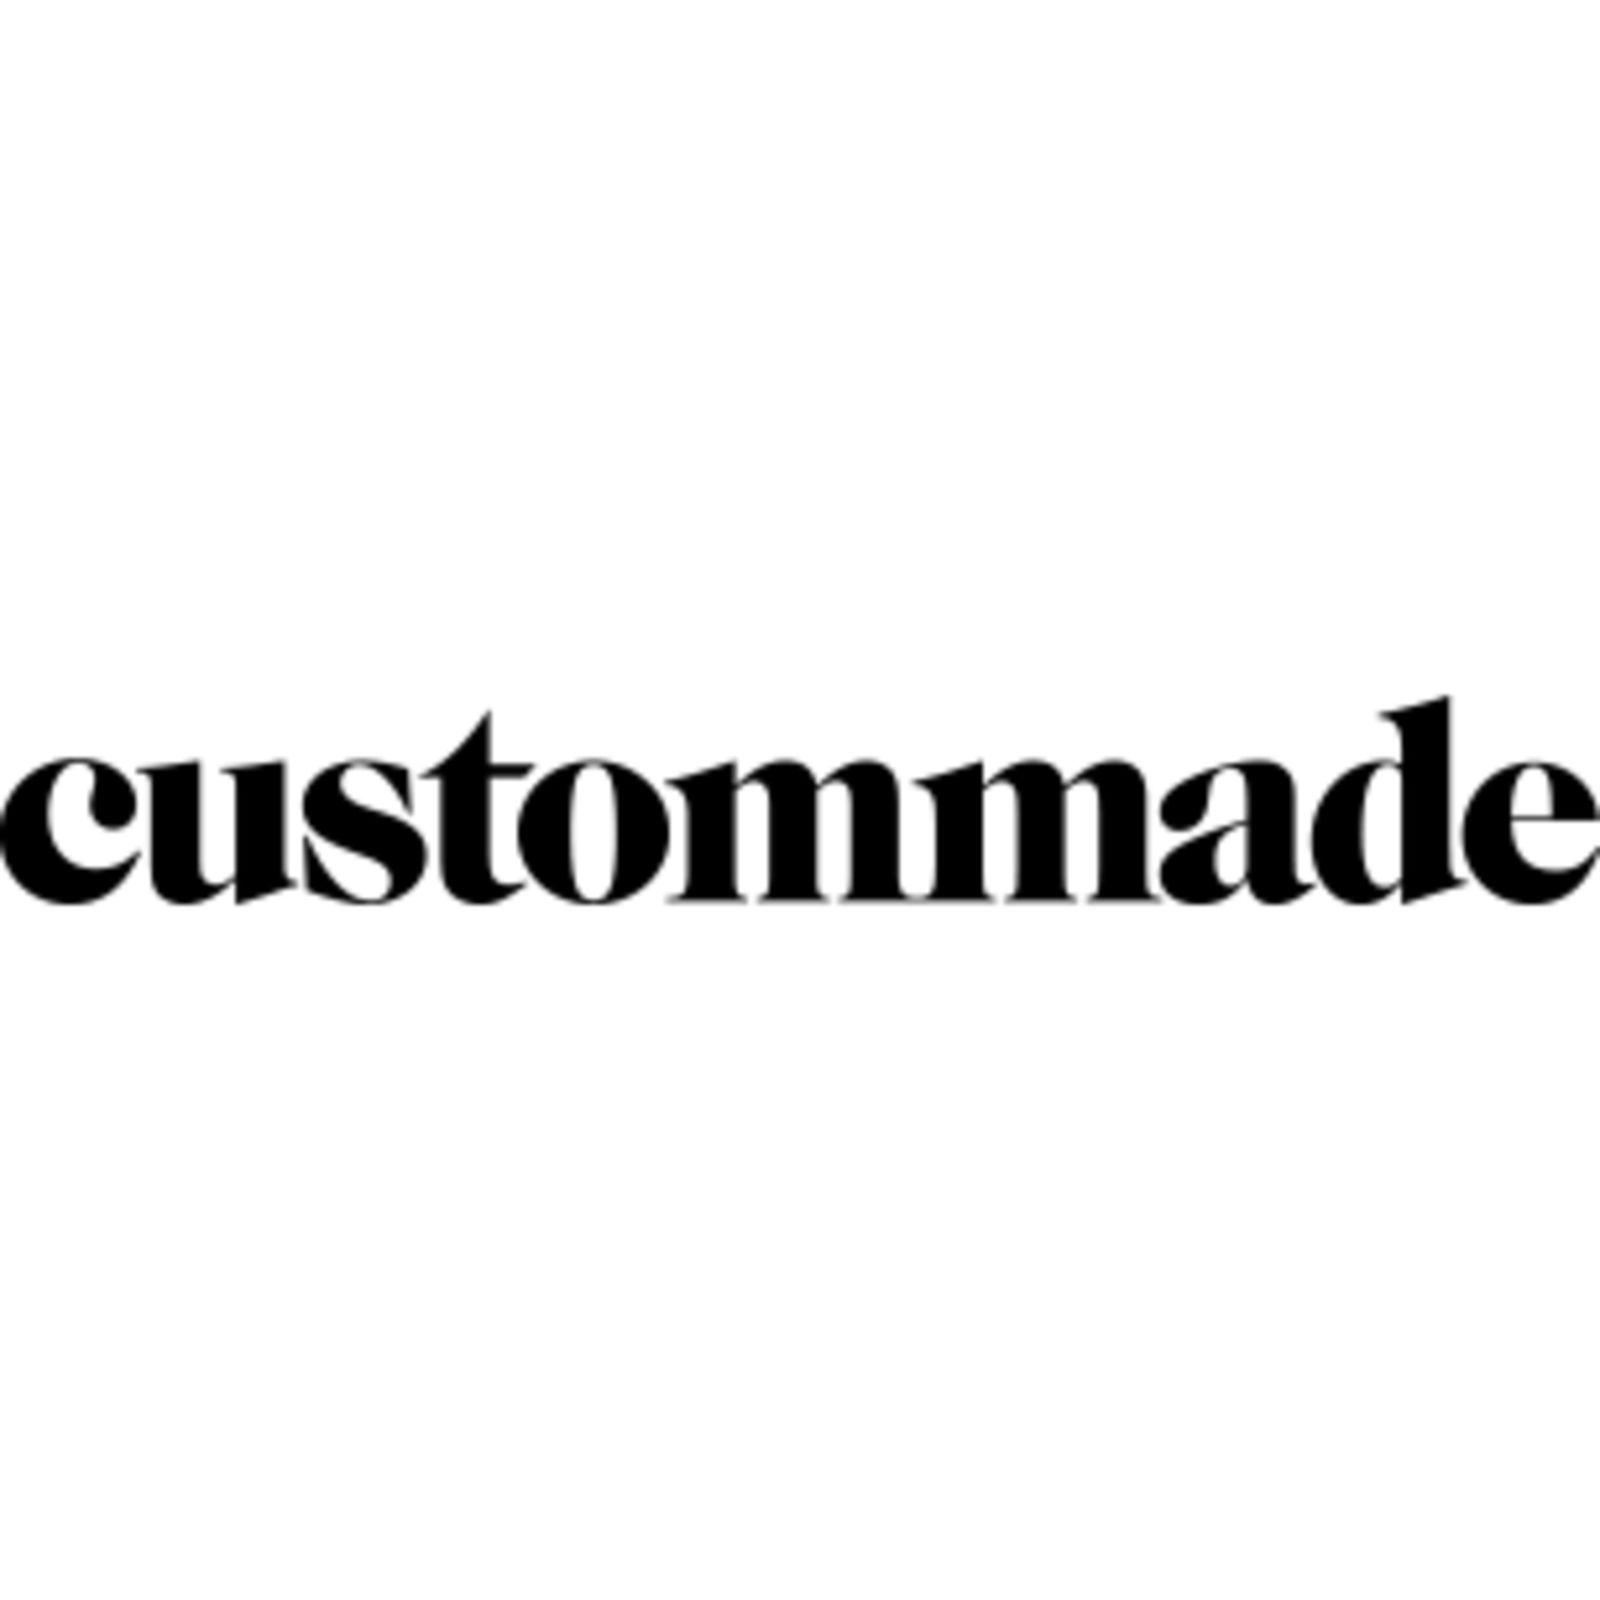 Custommade